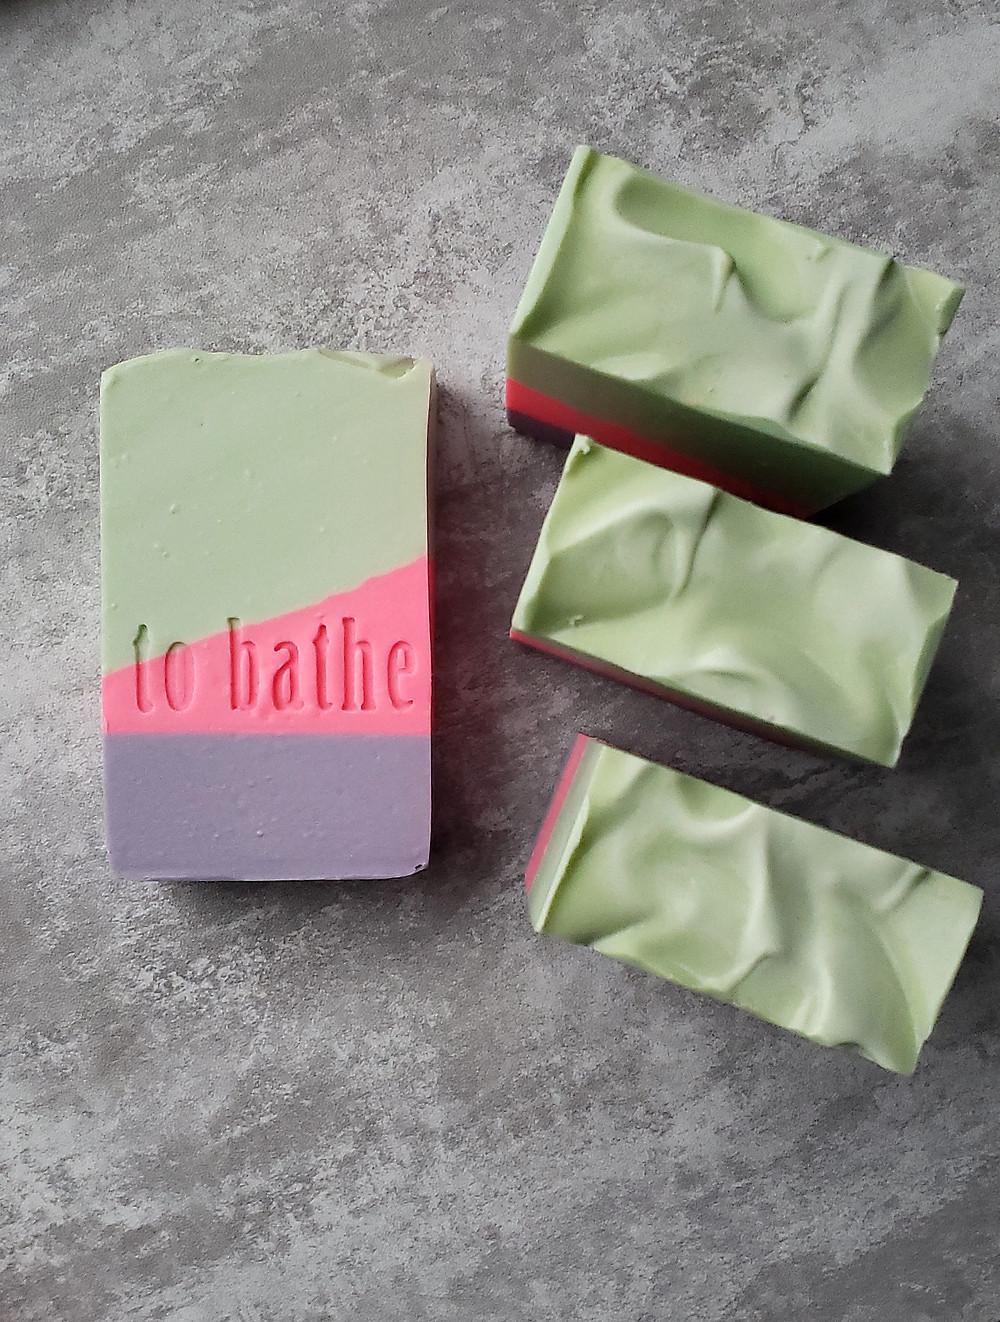 Cold process artisan soap